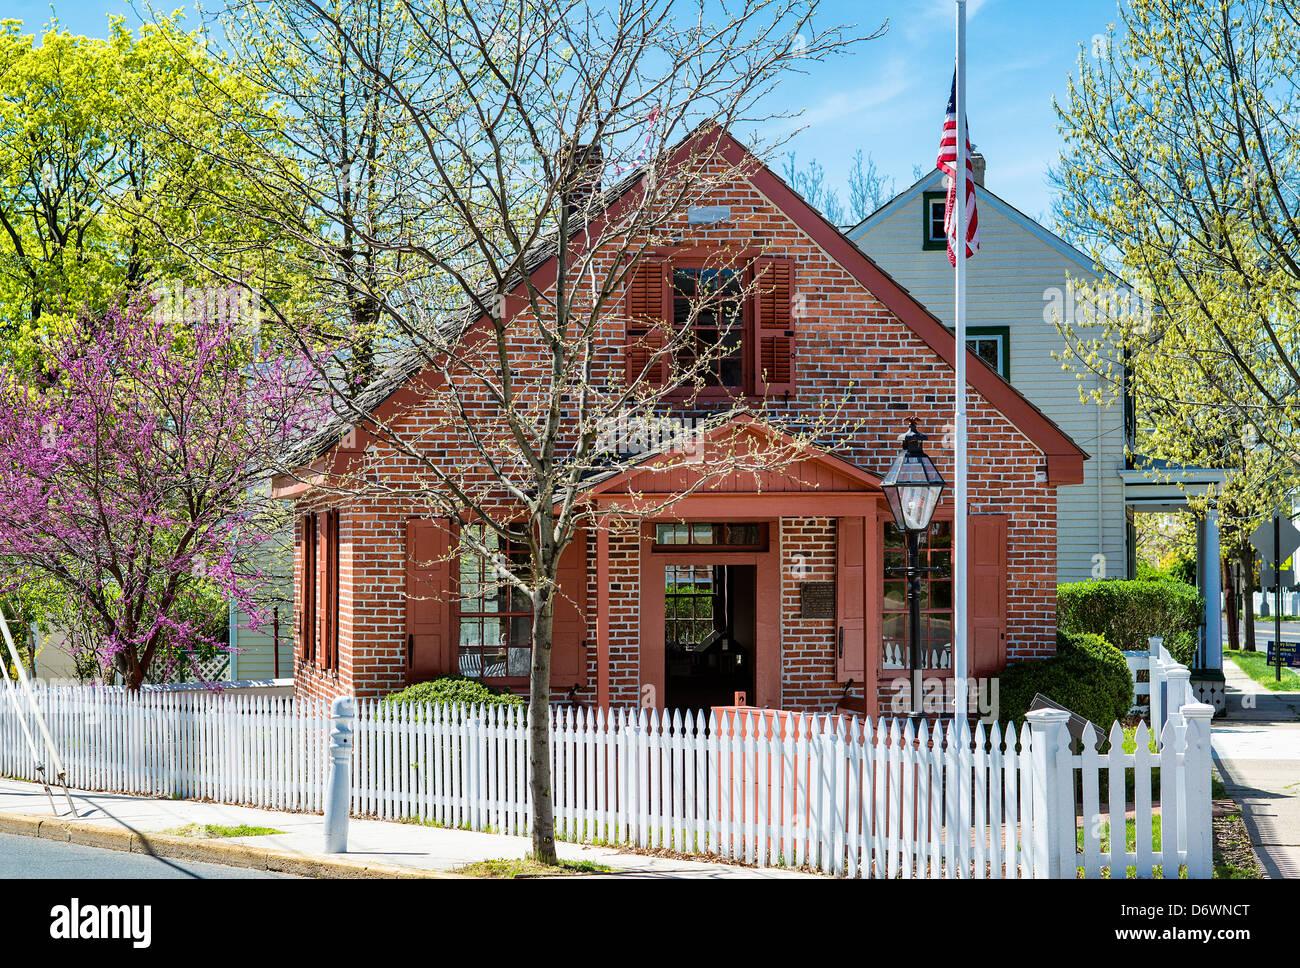 Clara Barton School, Bordentown, New Jersey, USA Founder of the American Red Cross - Stock Image